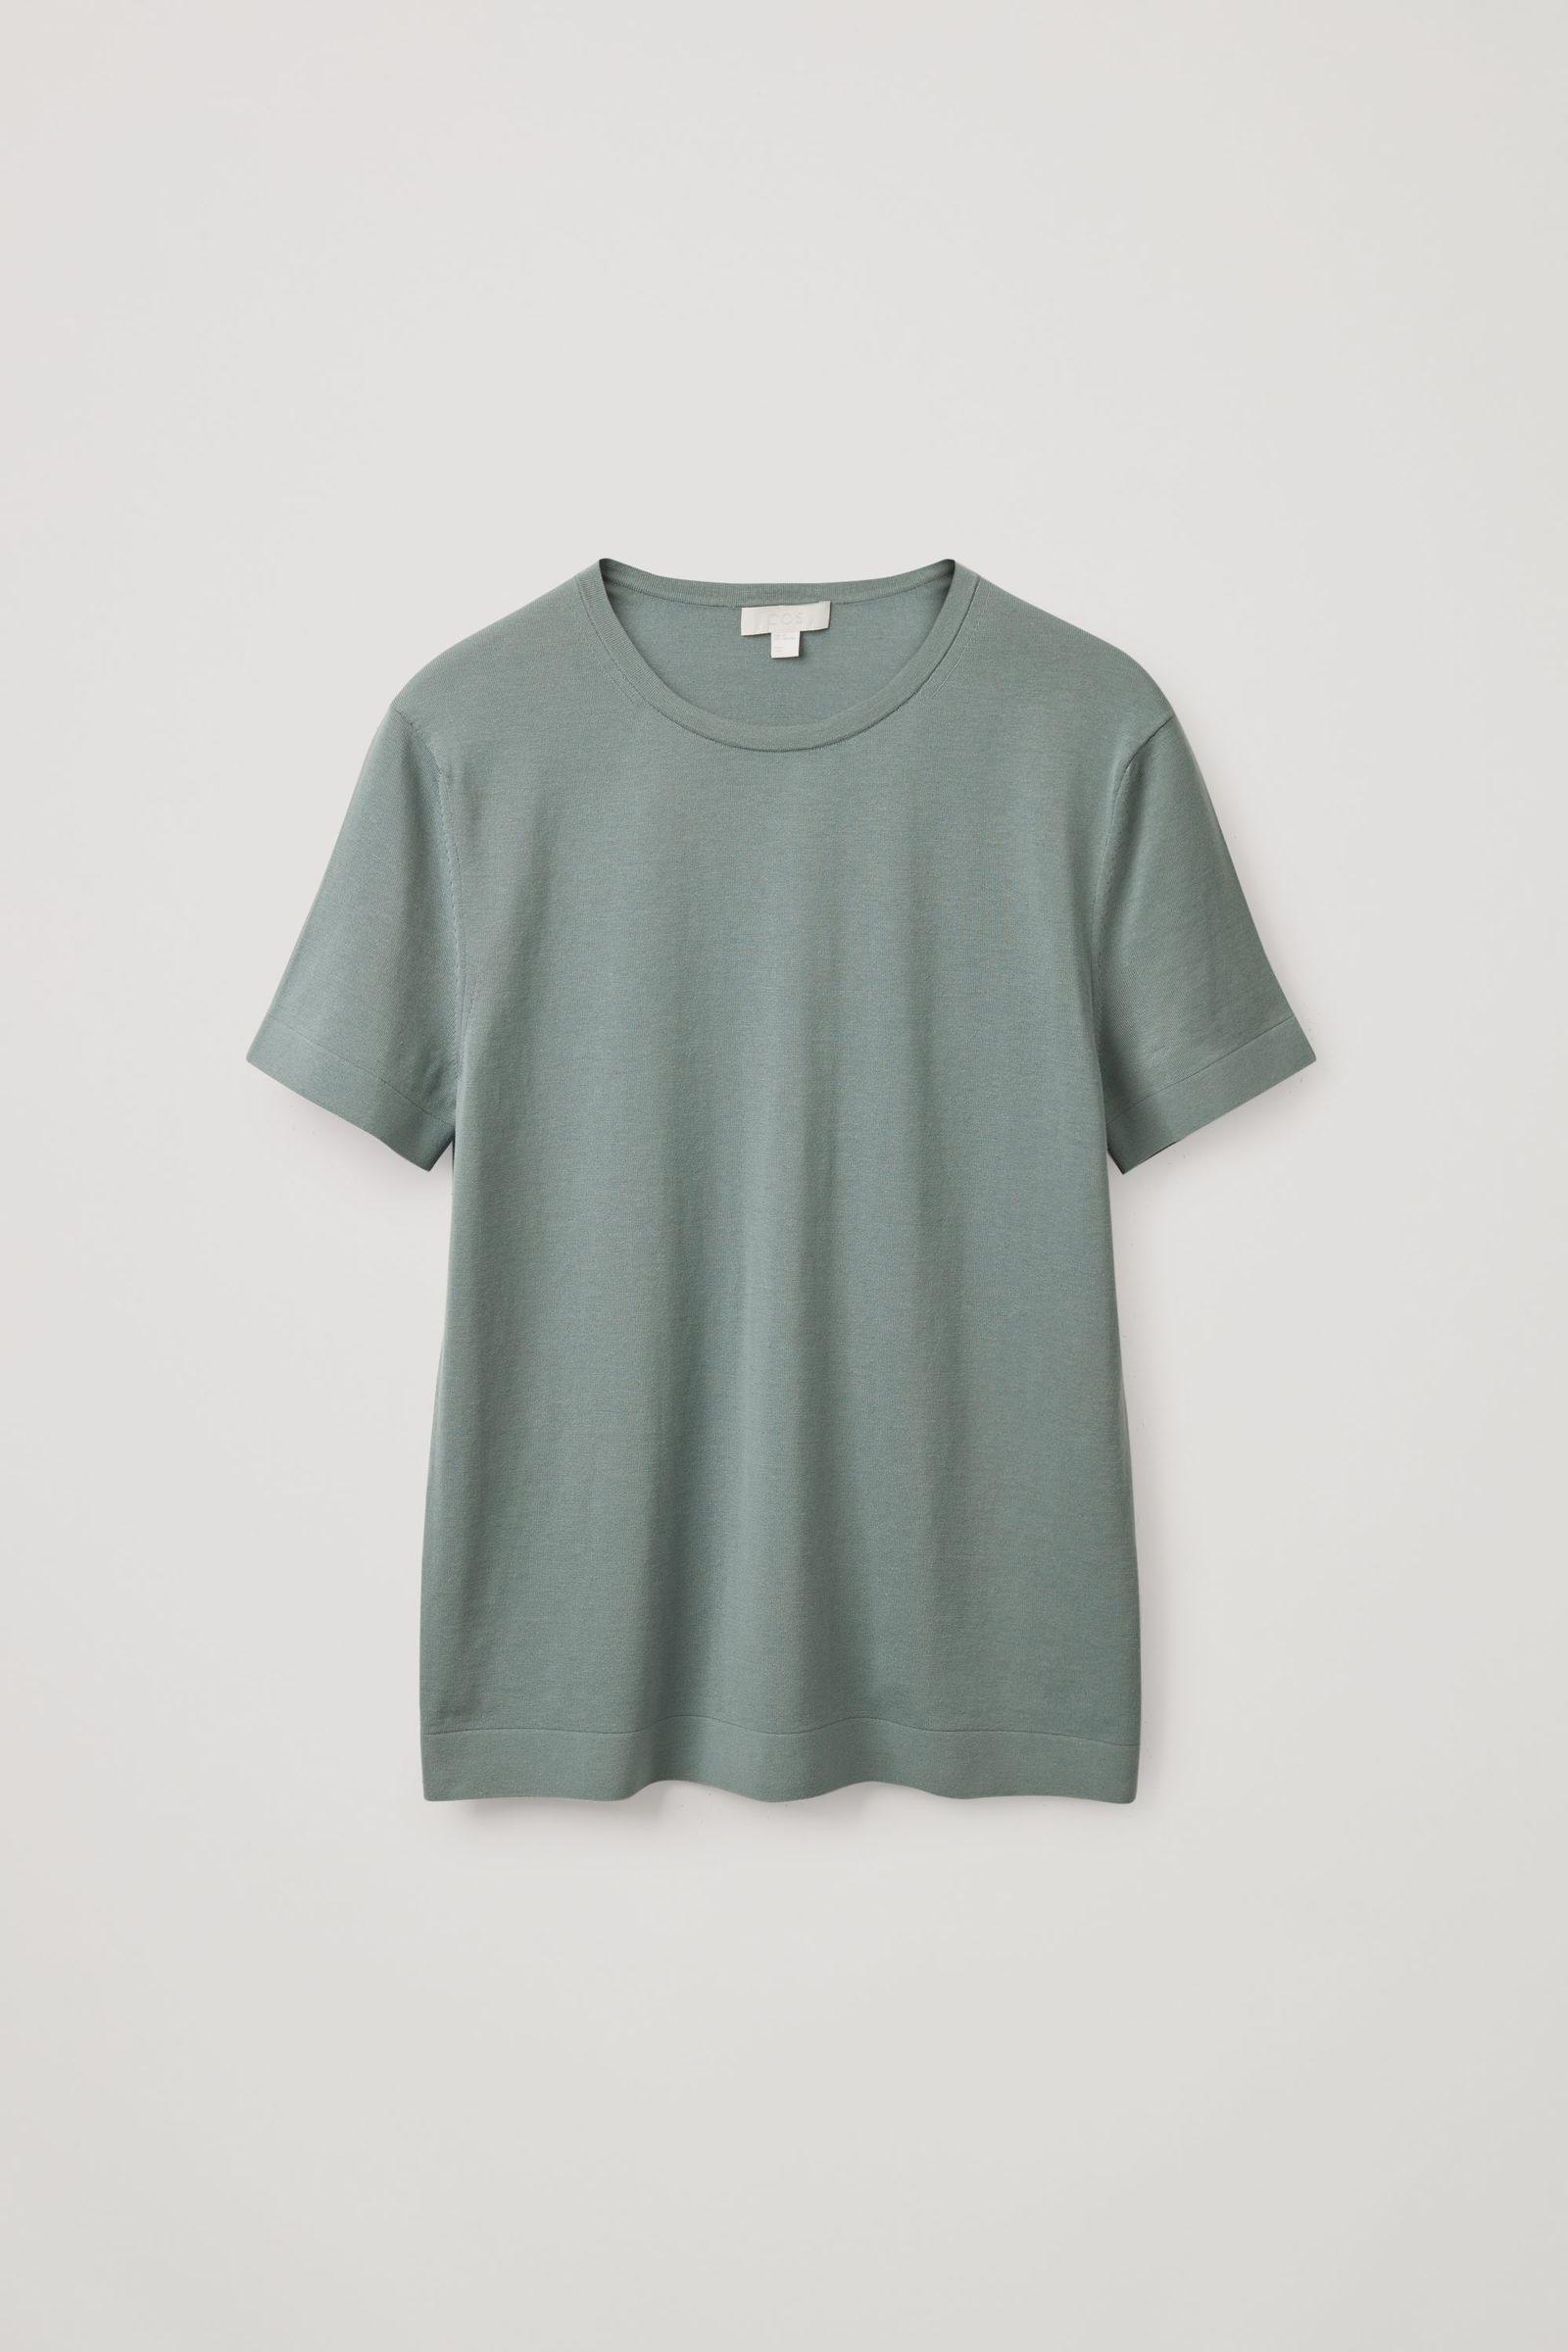 COS 슬림 핏 니티드 티셔츠의 터쿼이즈컬러 Product입니다.